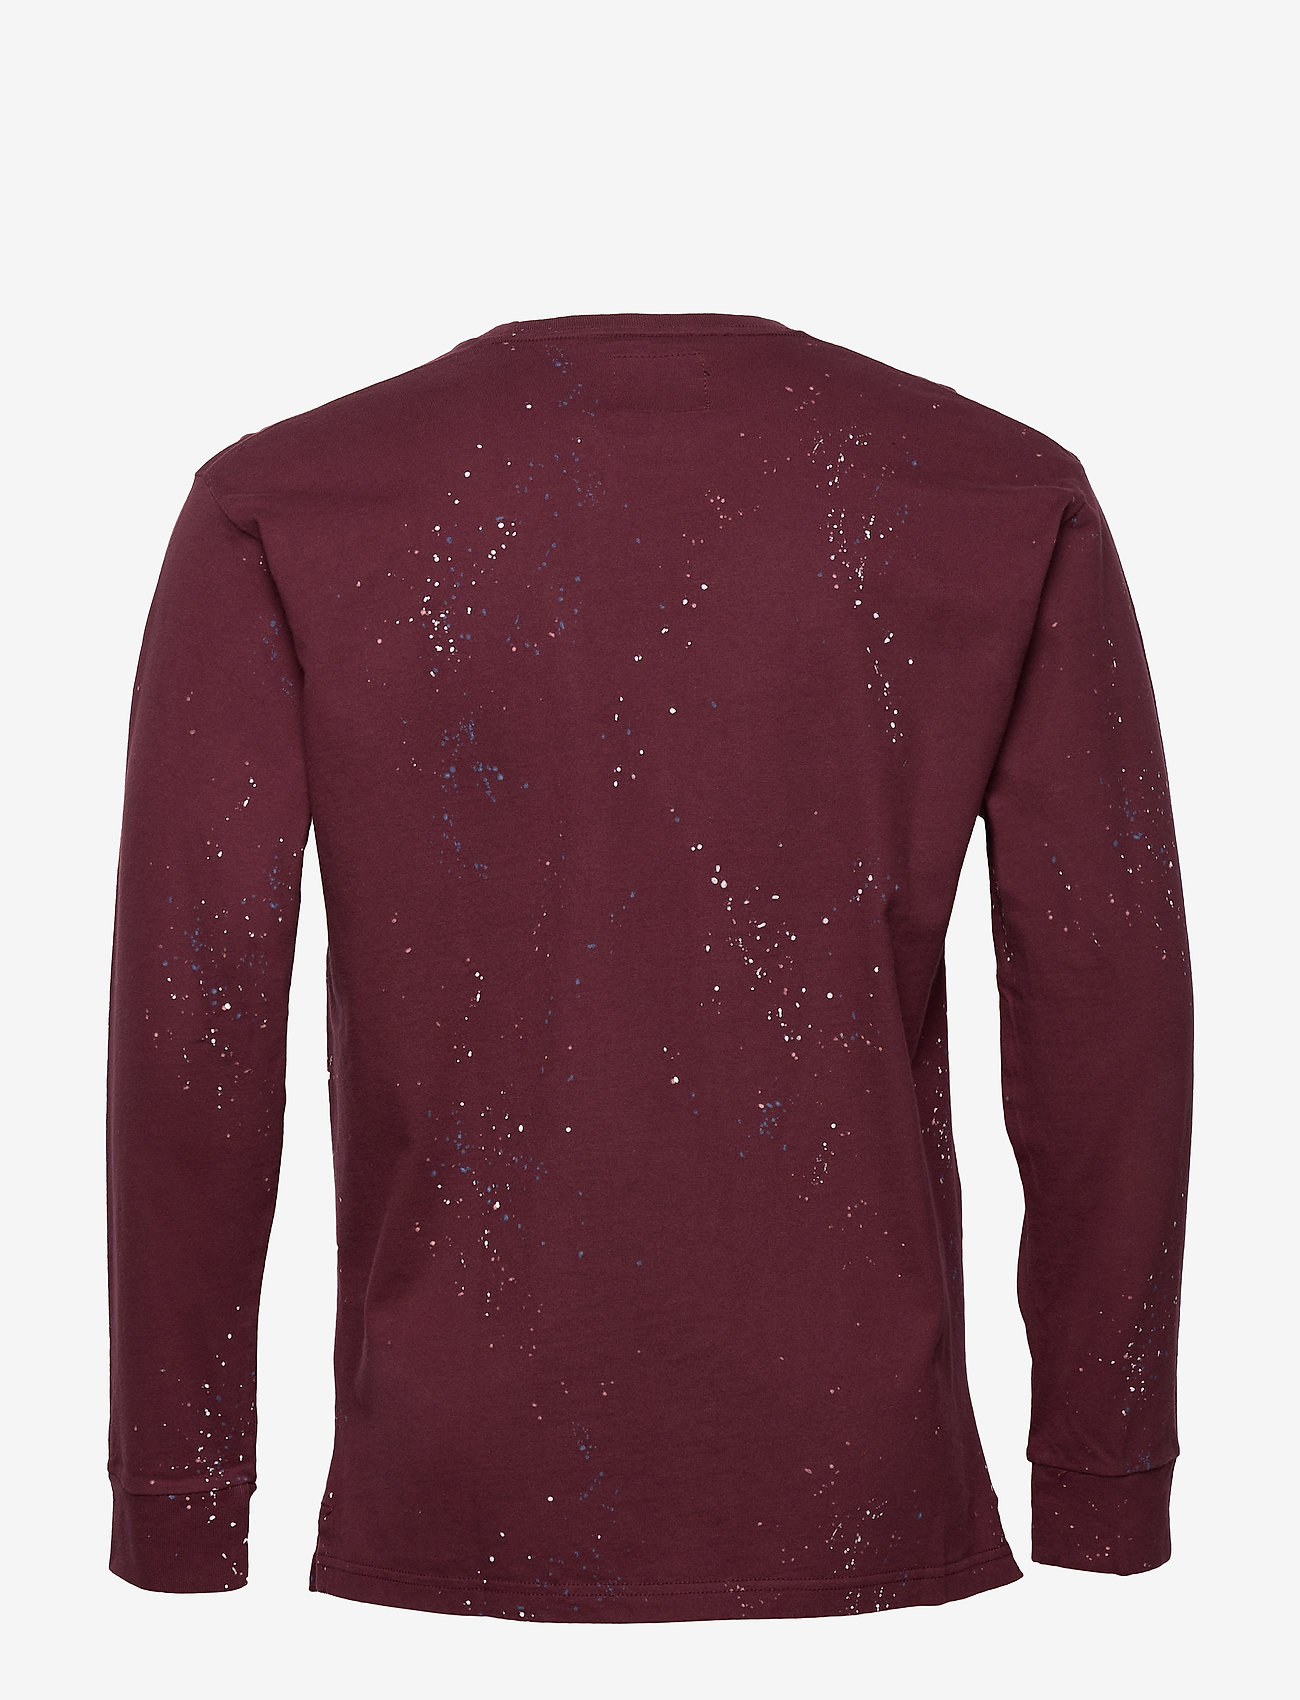 Abercrombie & Fitch Heavyweight Crew - T-shirts Burgundy Pattern